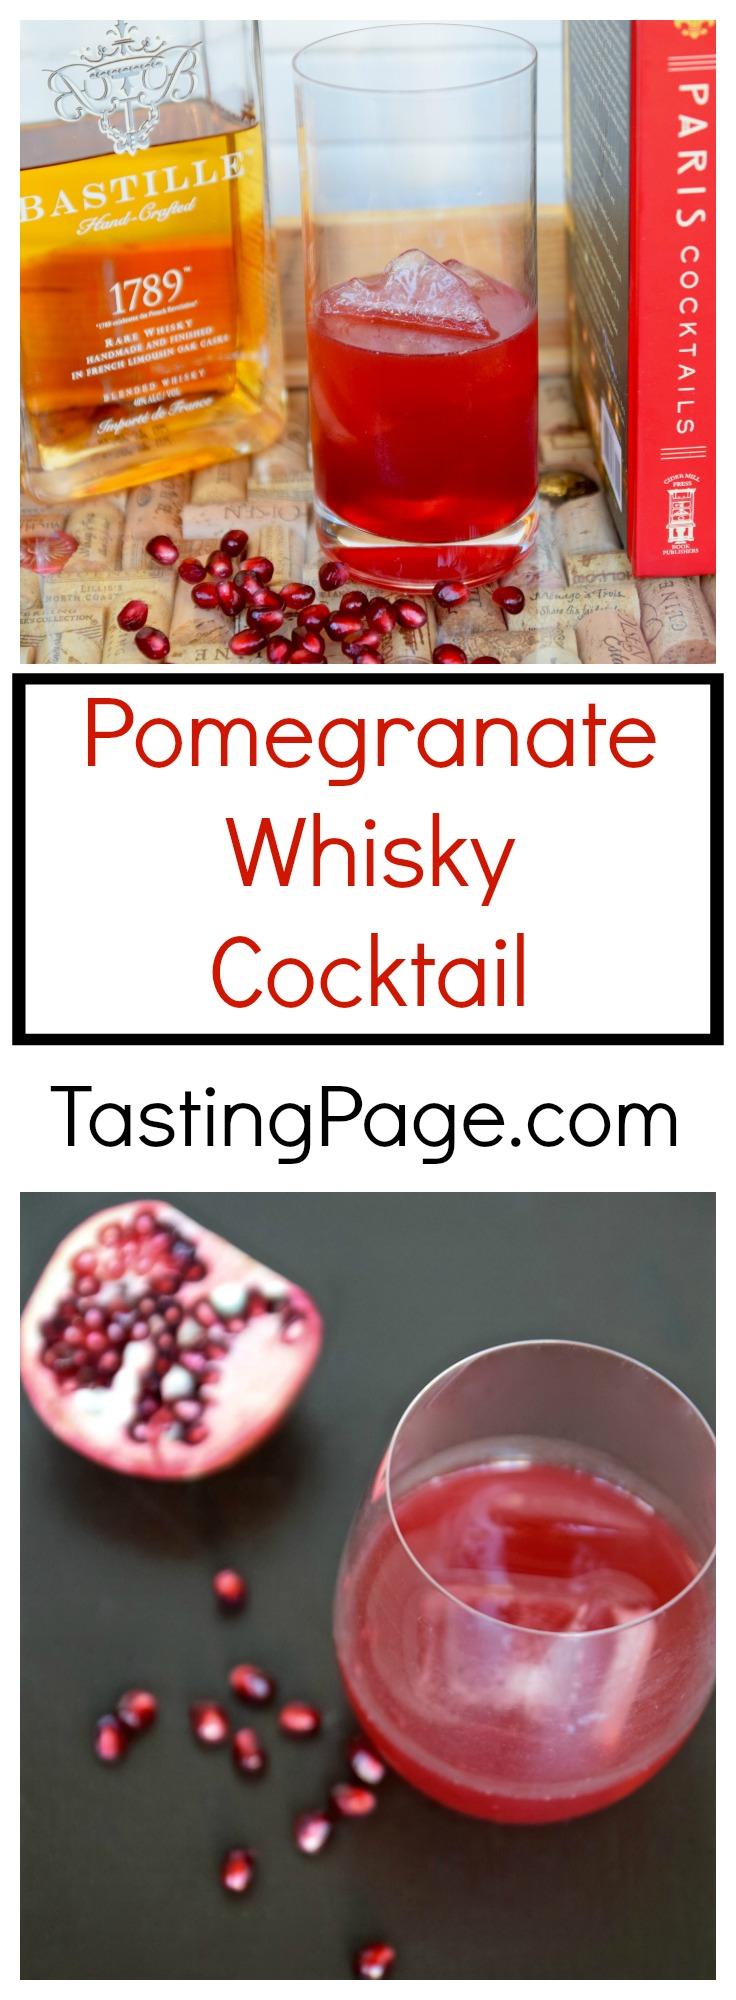 Pomegranate Whisky Cocktail | TastingPage.com